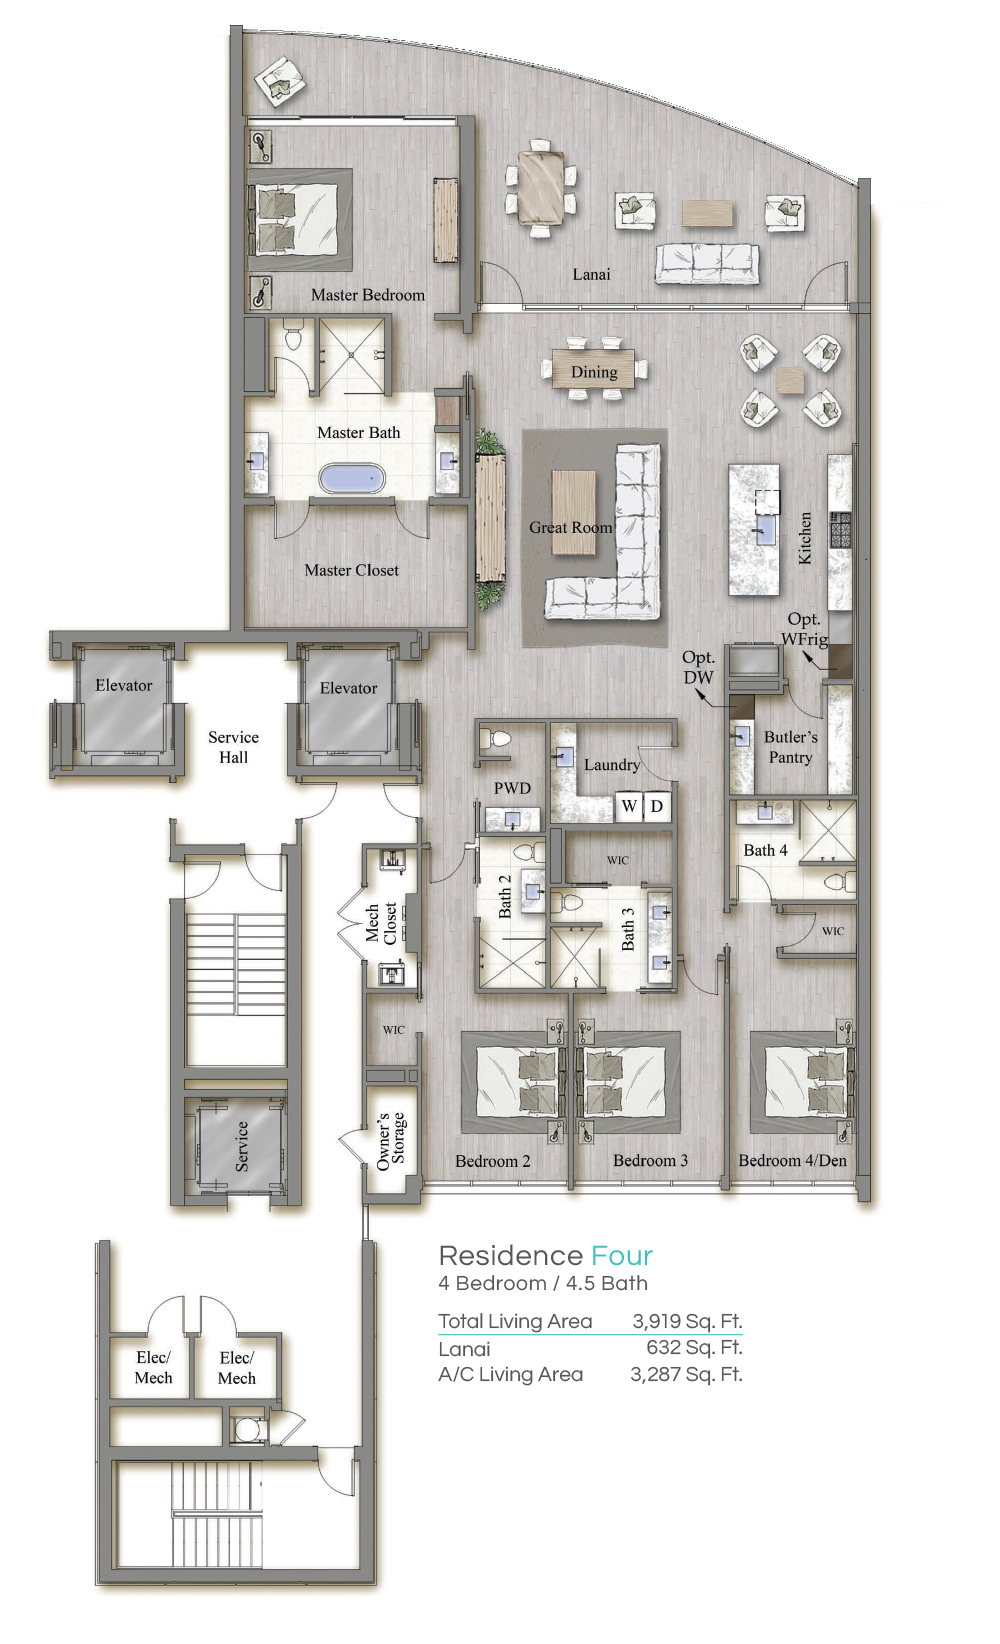 t2-floorplan-4-1-1-032318